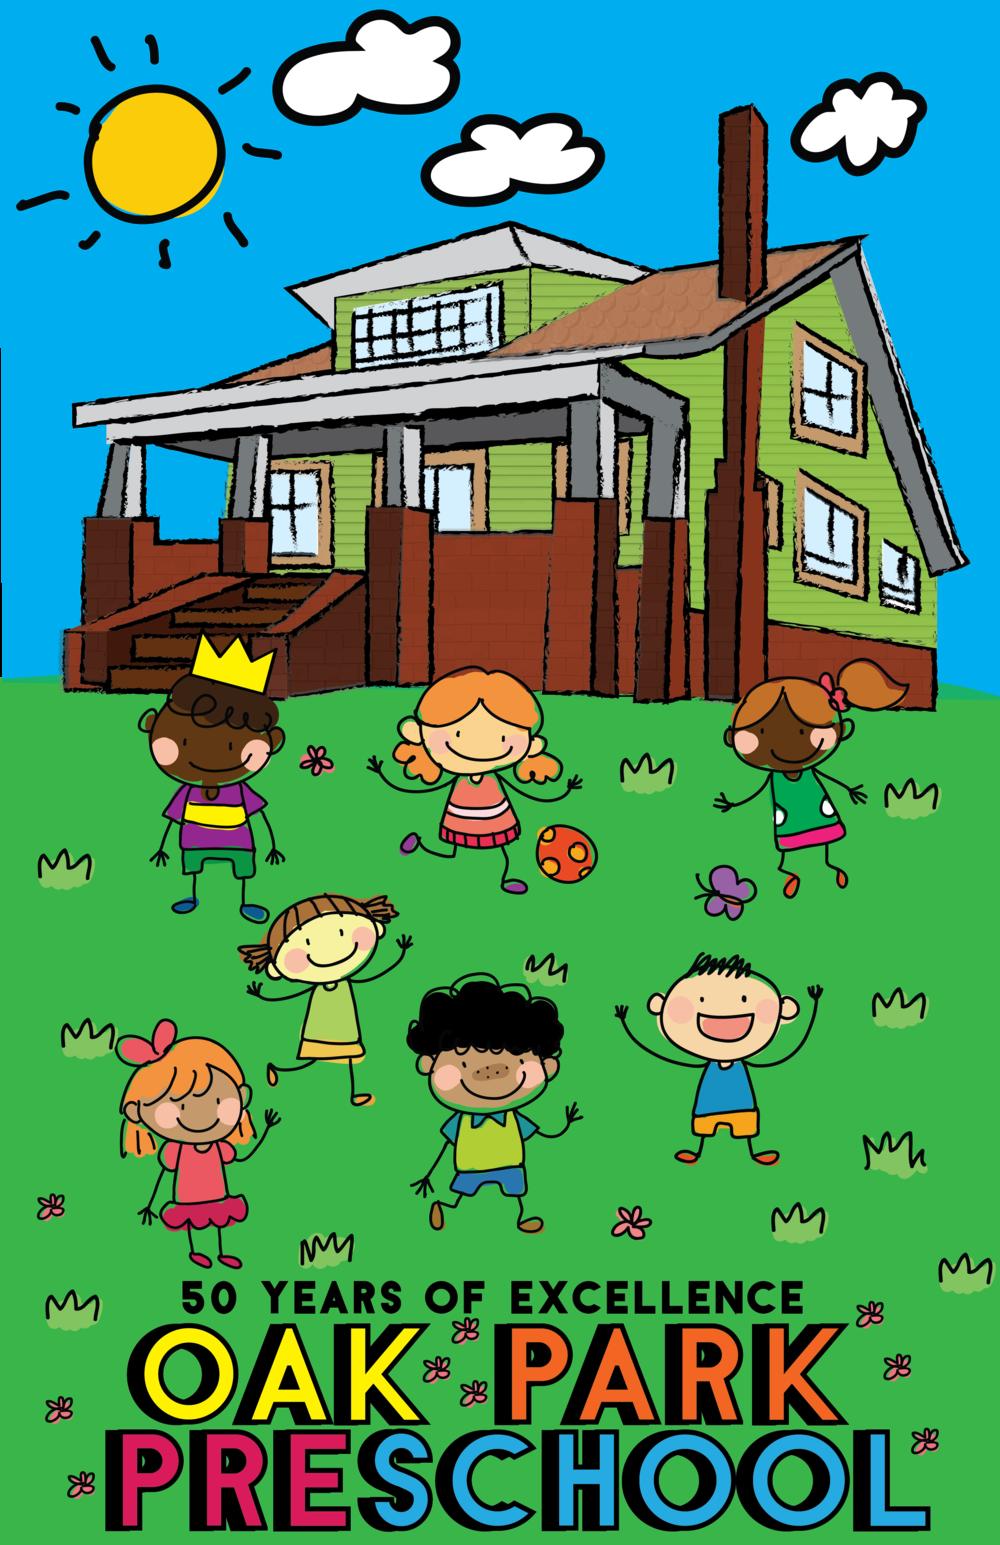 Oak Park Preschool house-01.jpg